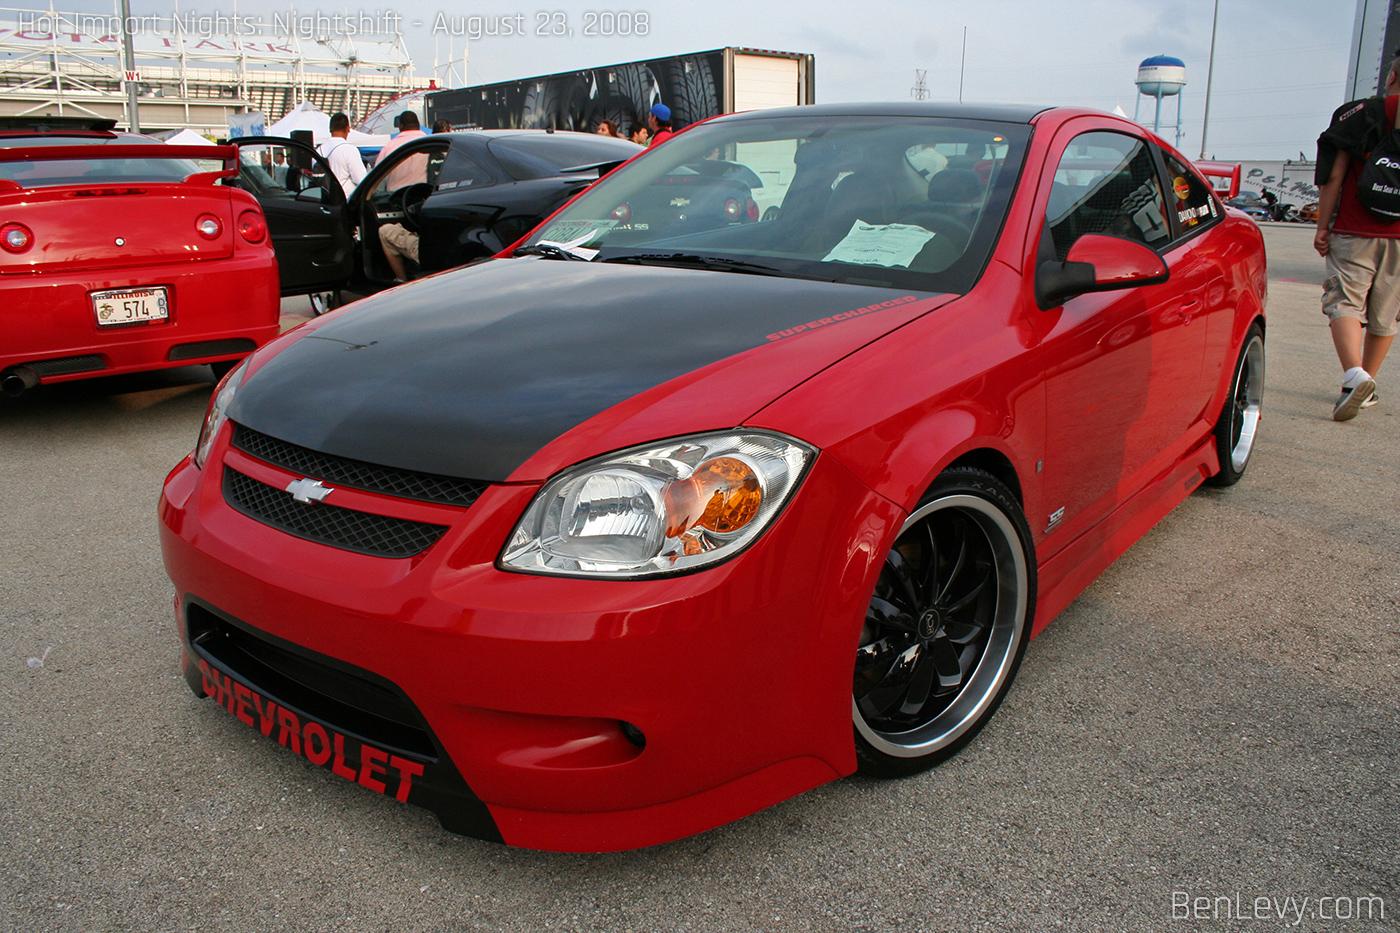 Chevy Cobalt SS Supercharged - BenLevy.com